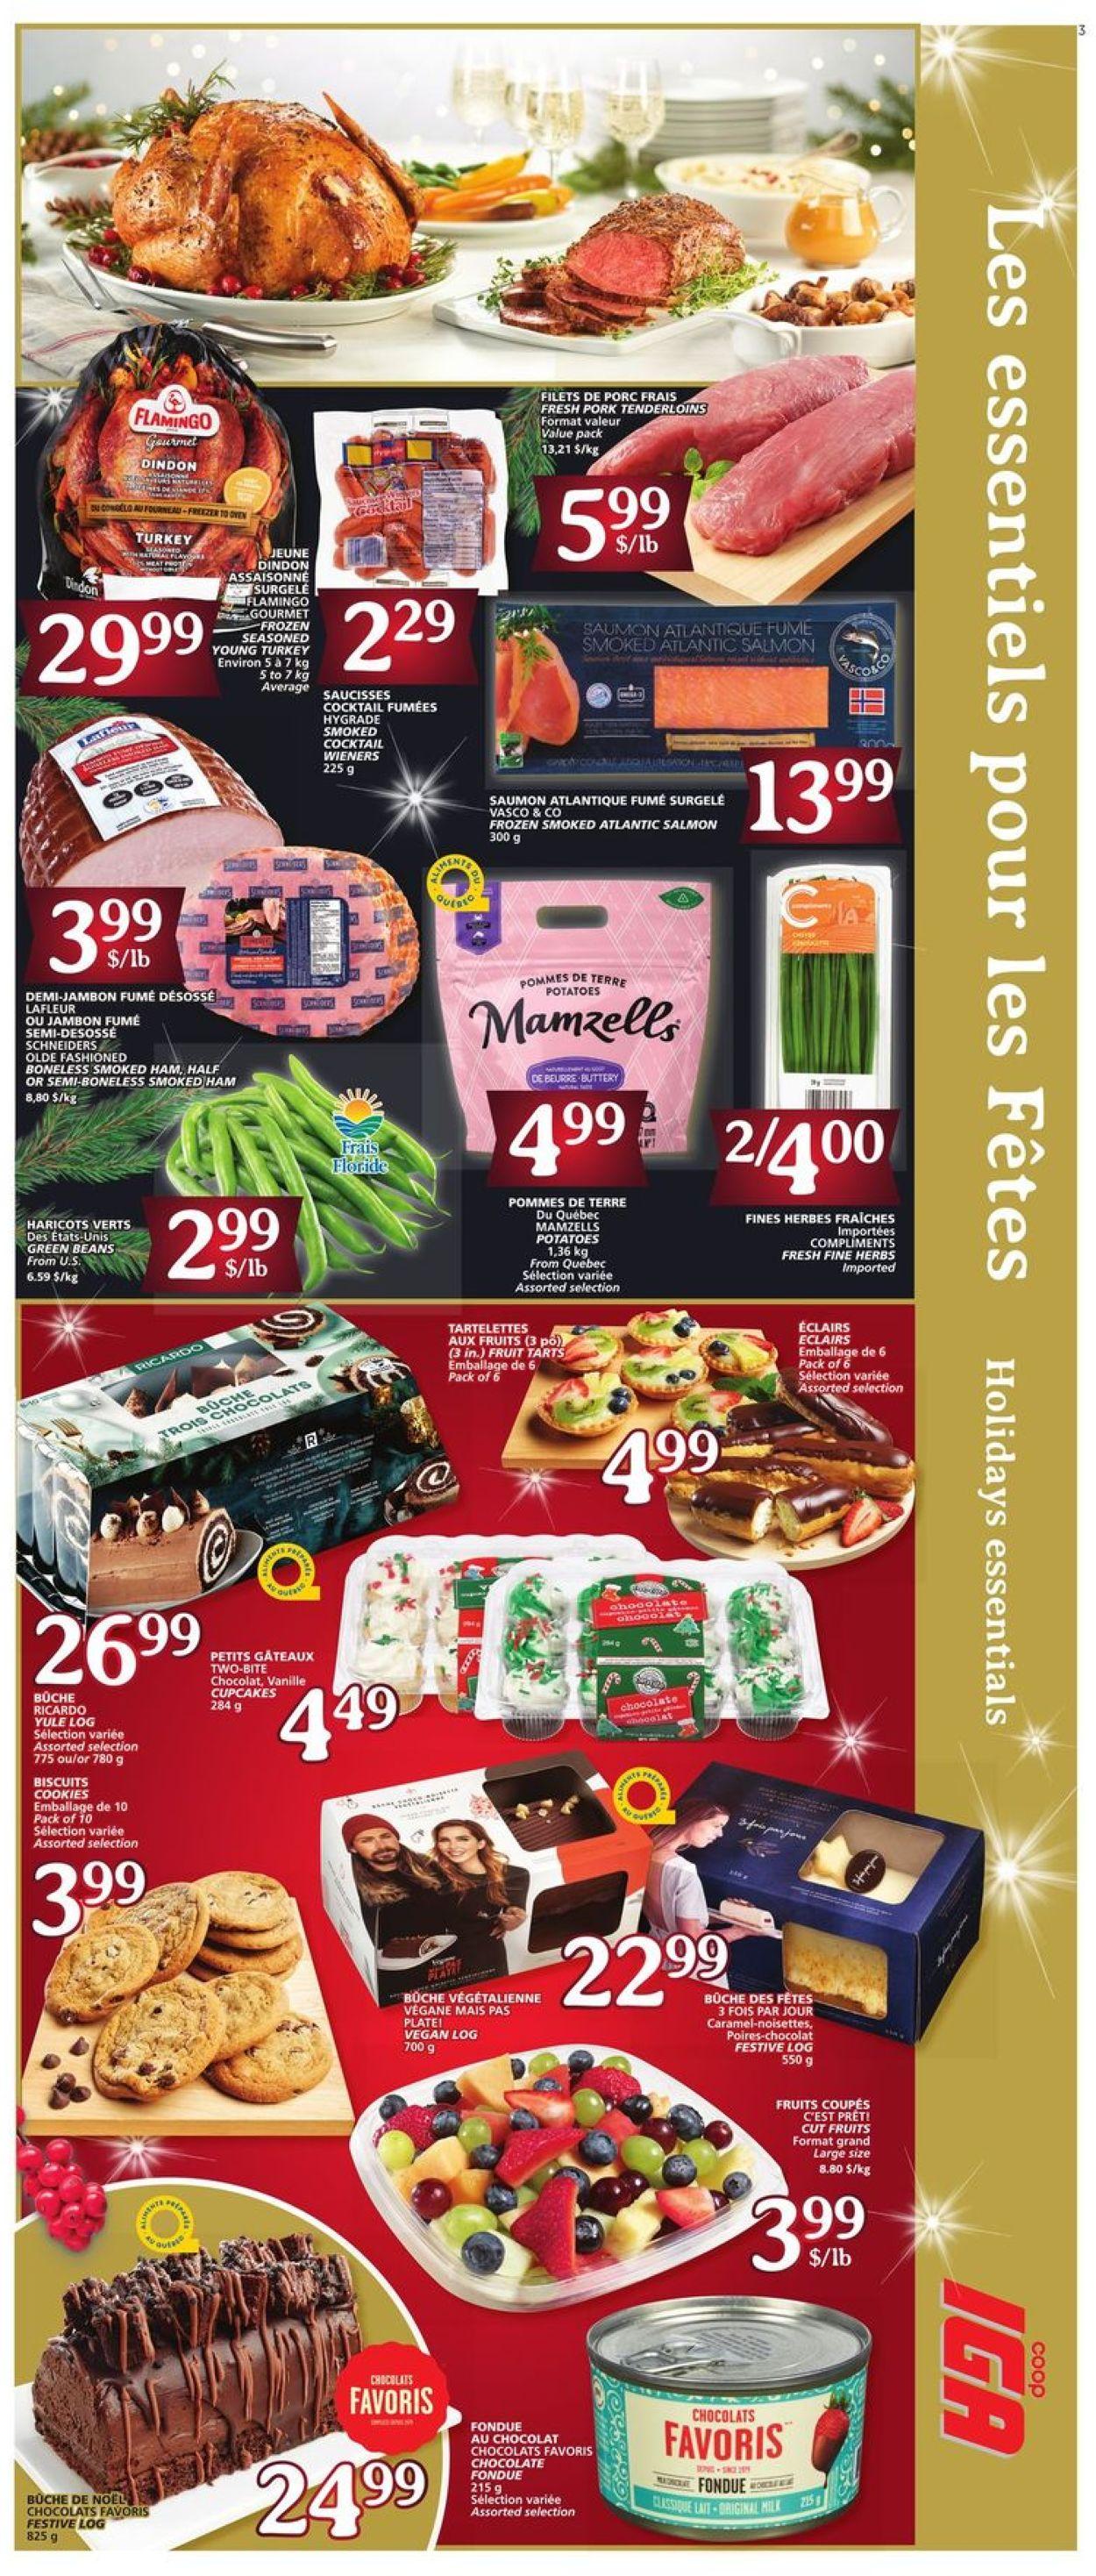 IGA - Christmas 2020 - Iles-de-la-Madeleine Flyer - 12/17-12/23/2020 (Page 3)